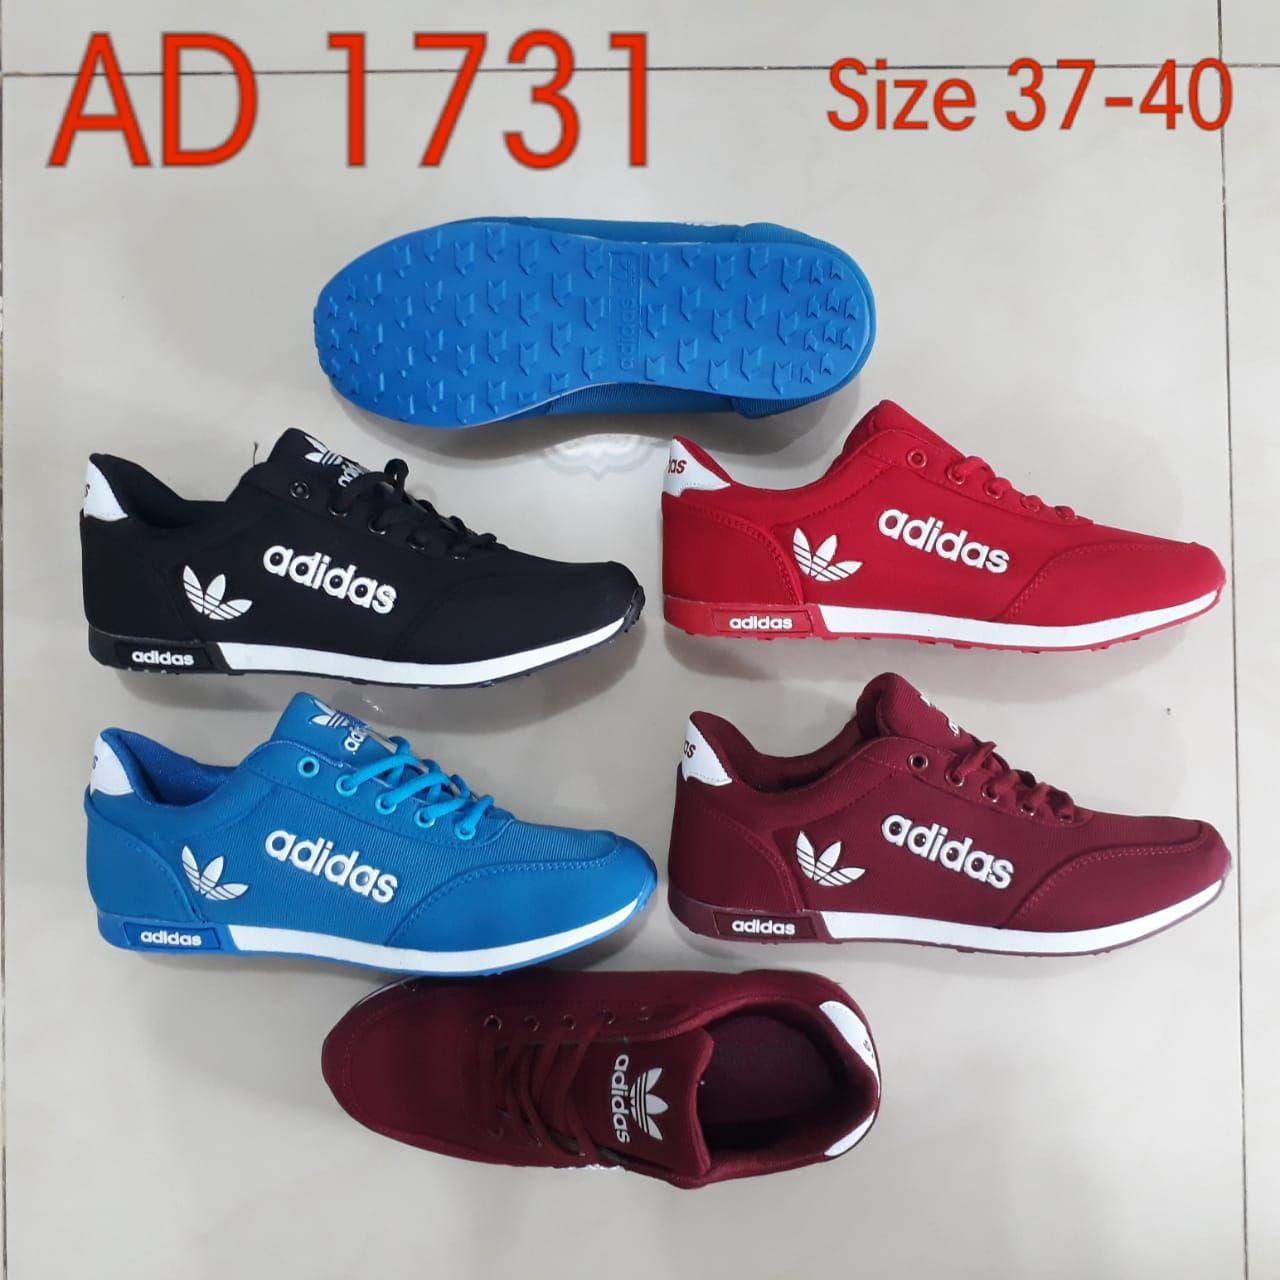 Sale Shoes V21d0 Sepatu Wanita Adidas Neo Running Woman I Lokal Import Q0x6  - Blanja. 7d2873e919